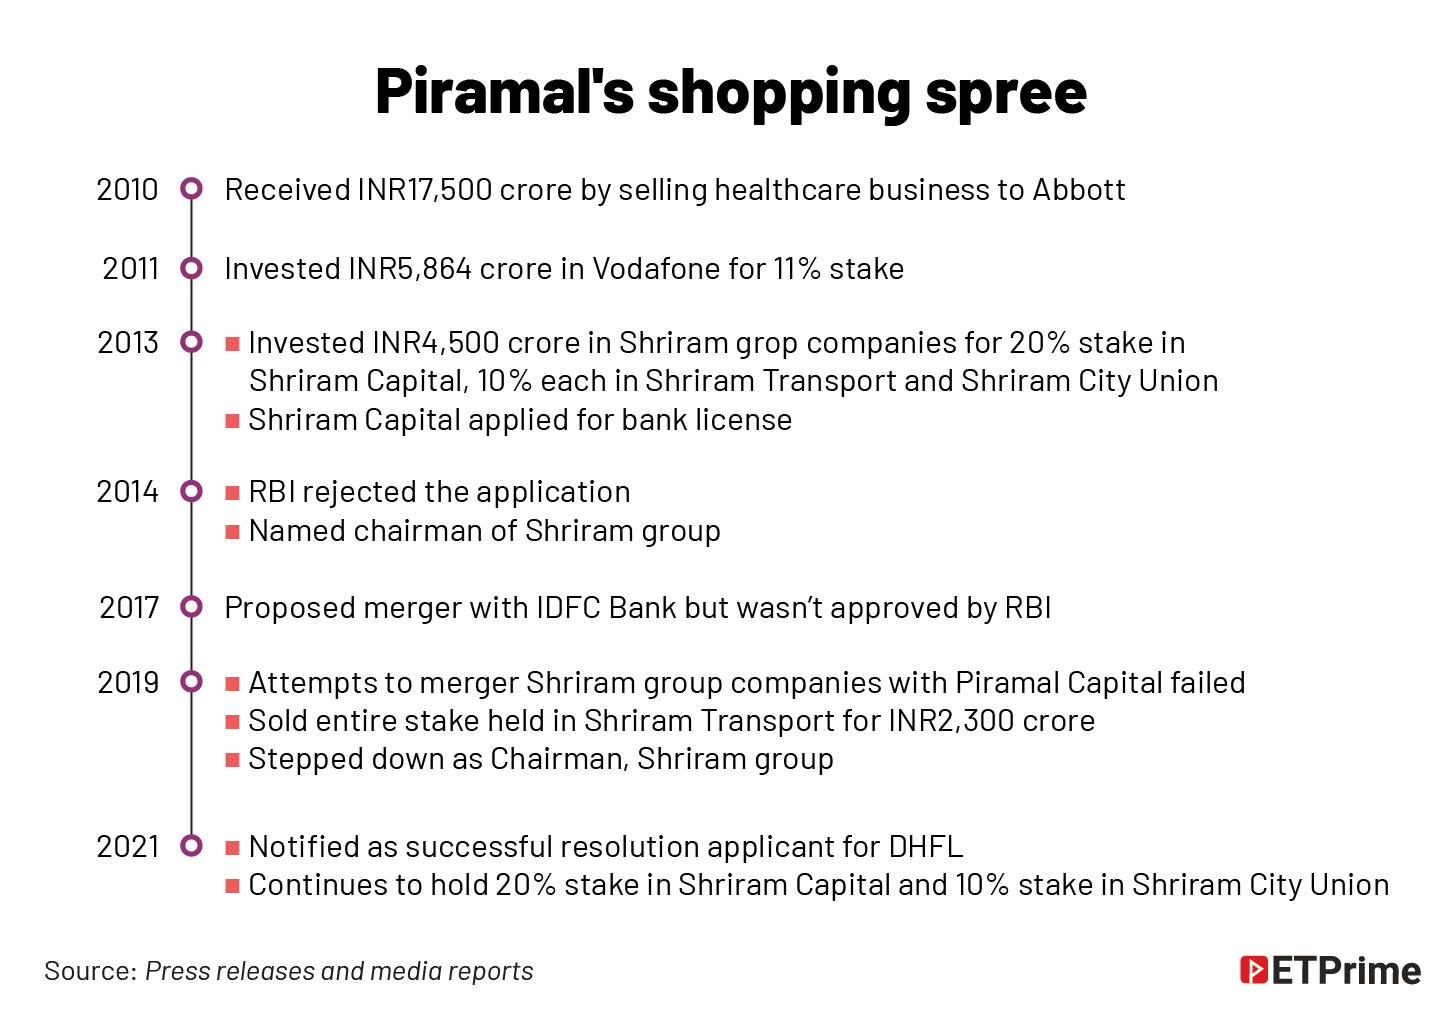 Piramal's shopping spree @2x